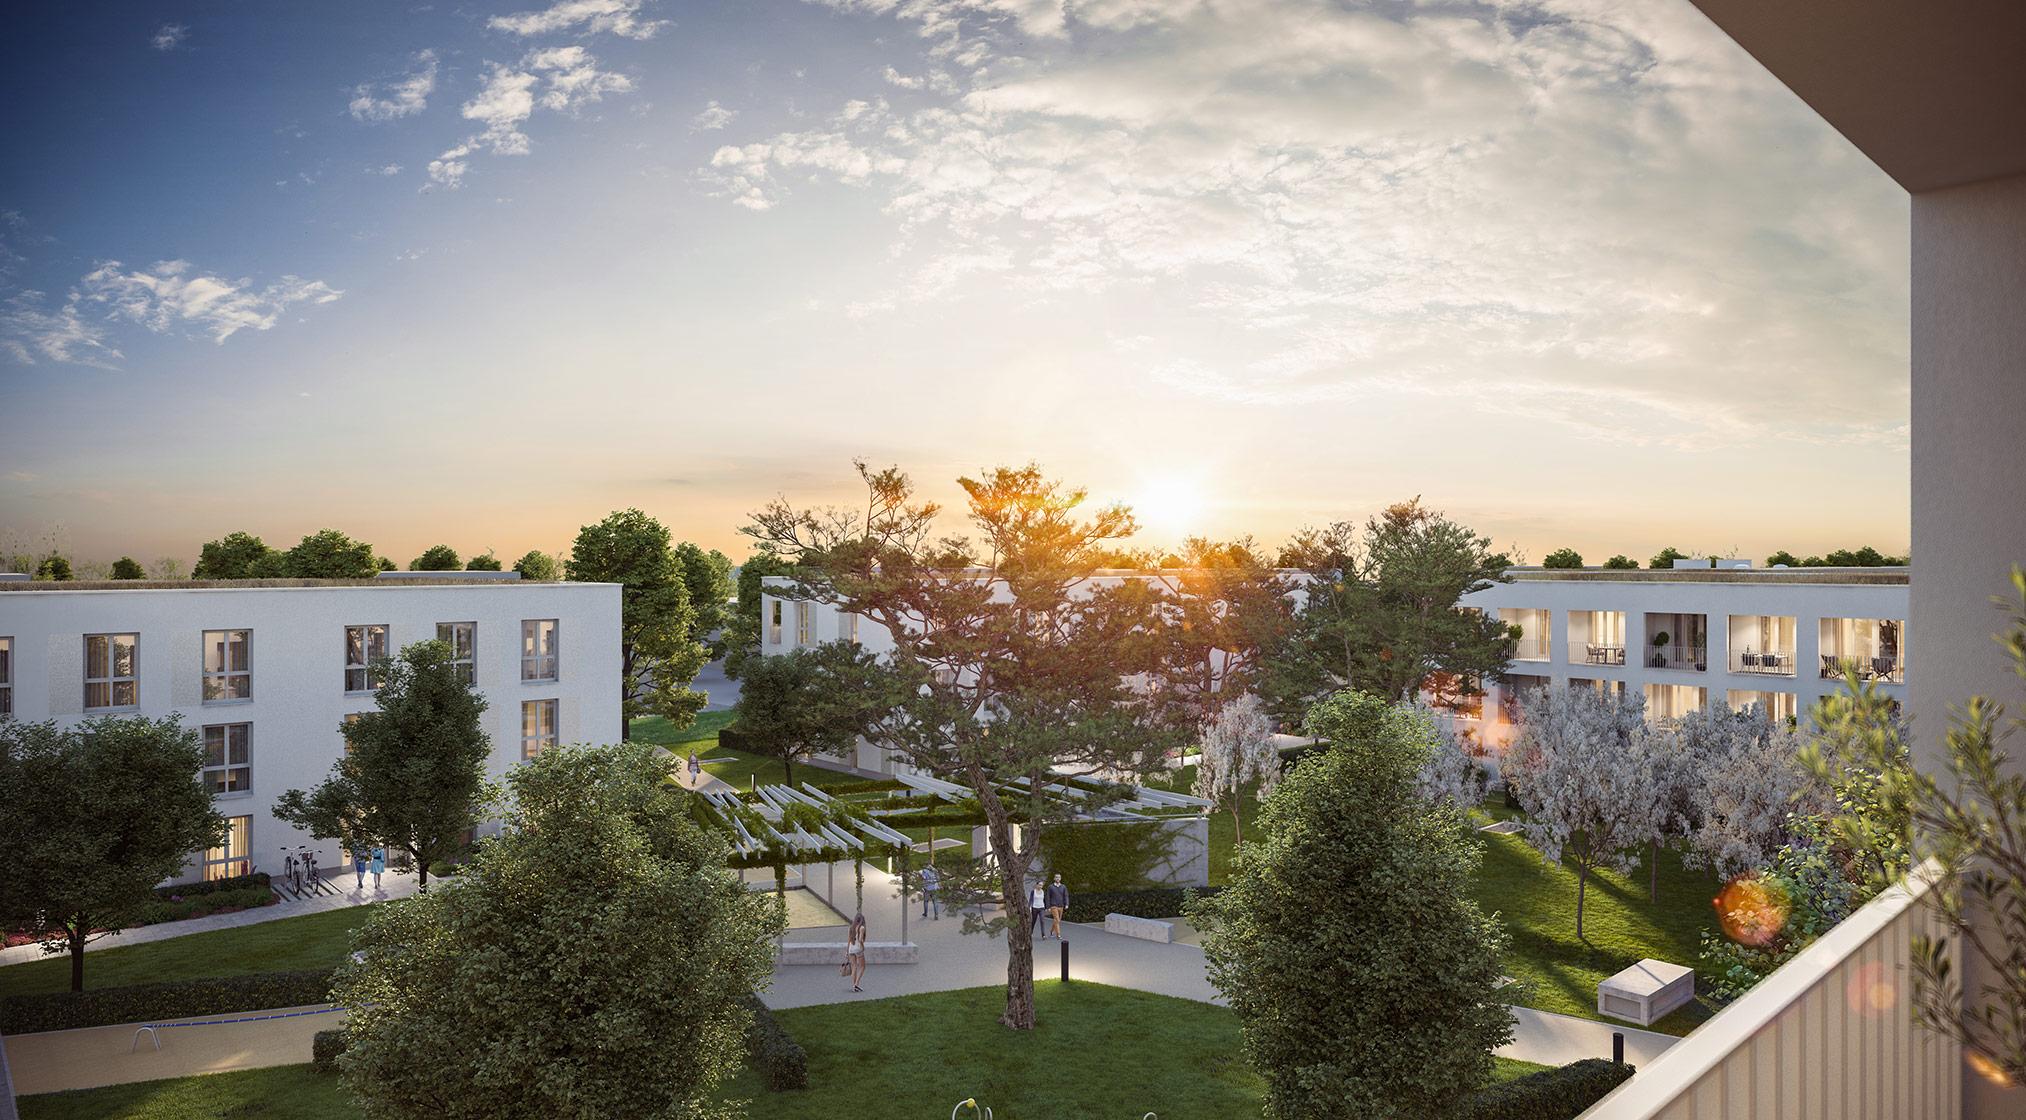 Eigentumswohnungen Kirchheim bei München: Grüne Mitte Kirchheim - Park-Carré - Projektdetails Illustration 2